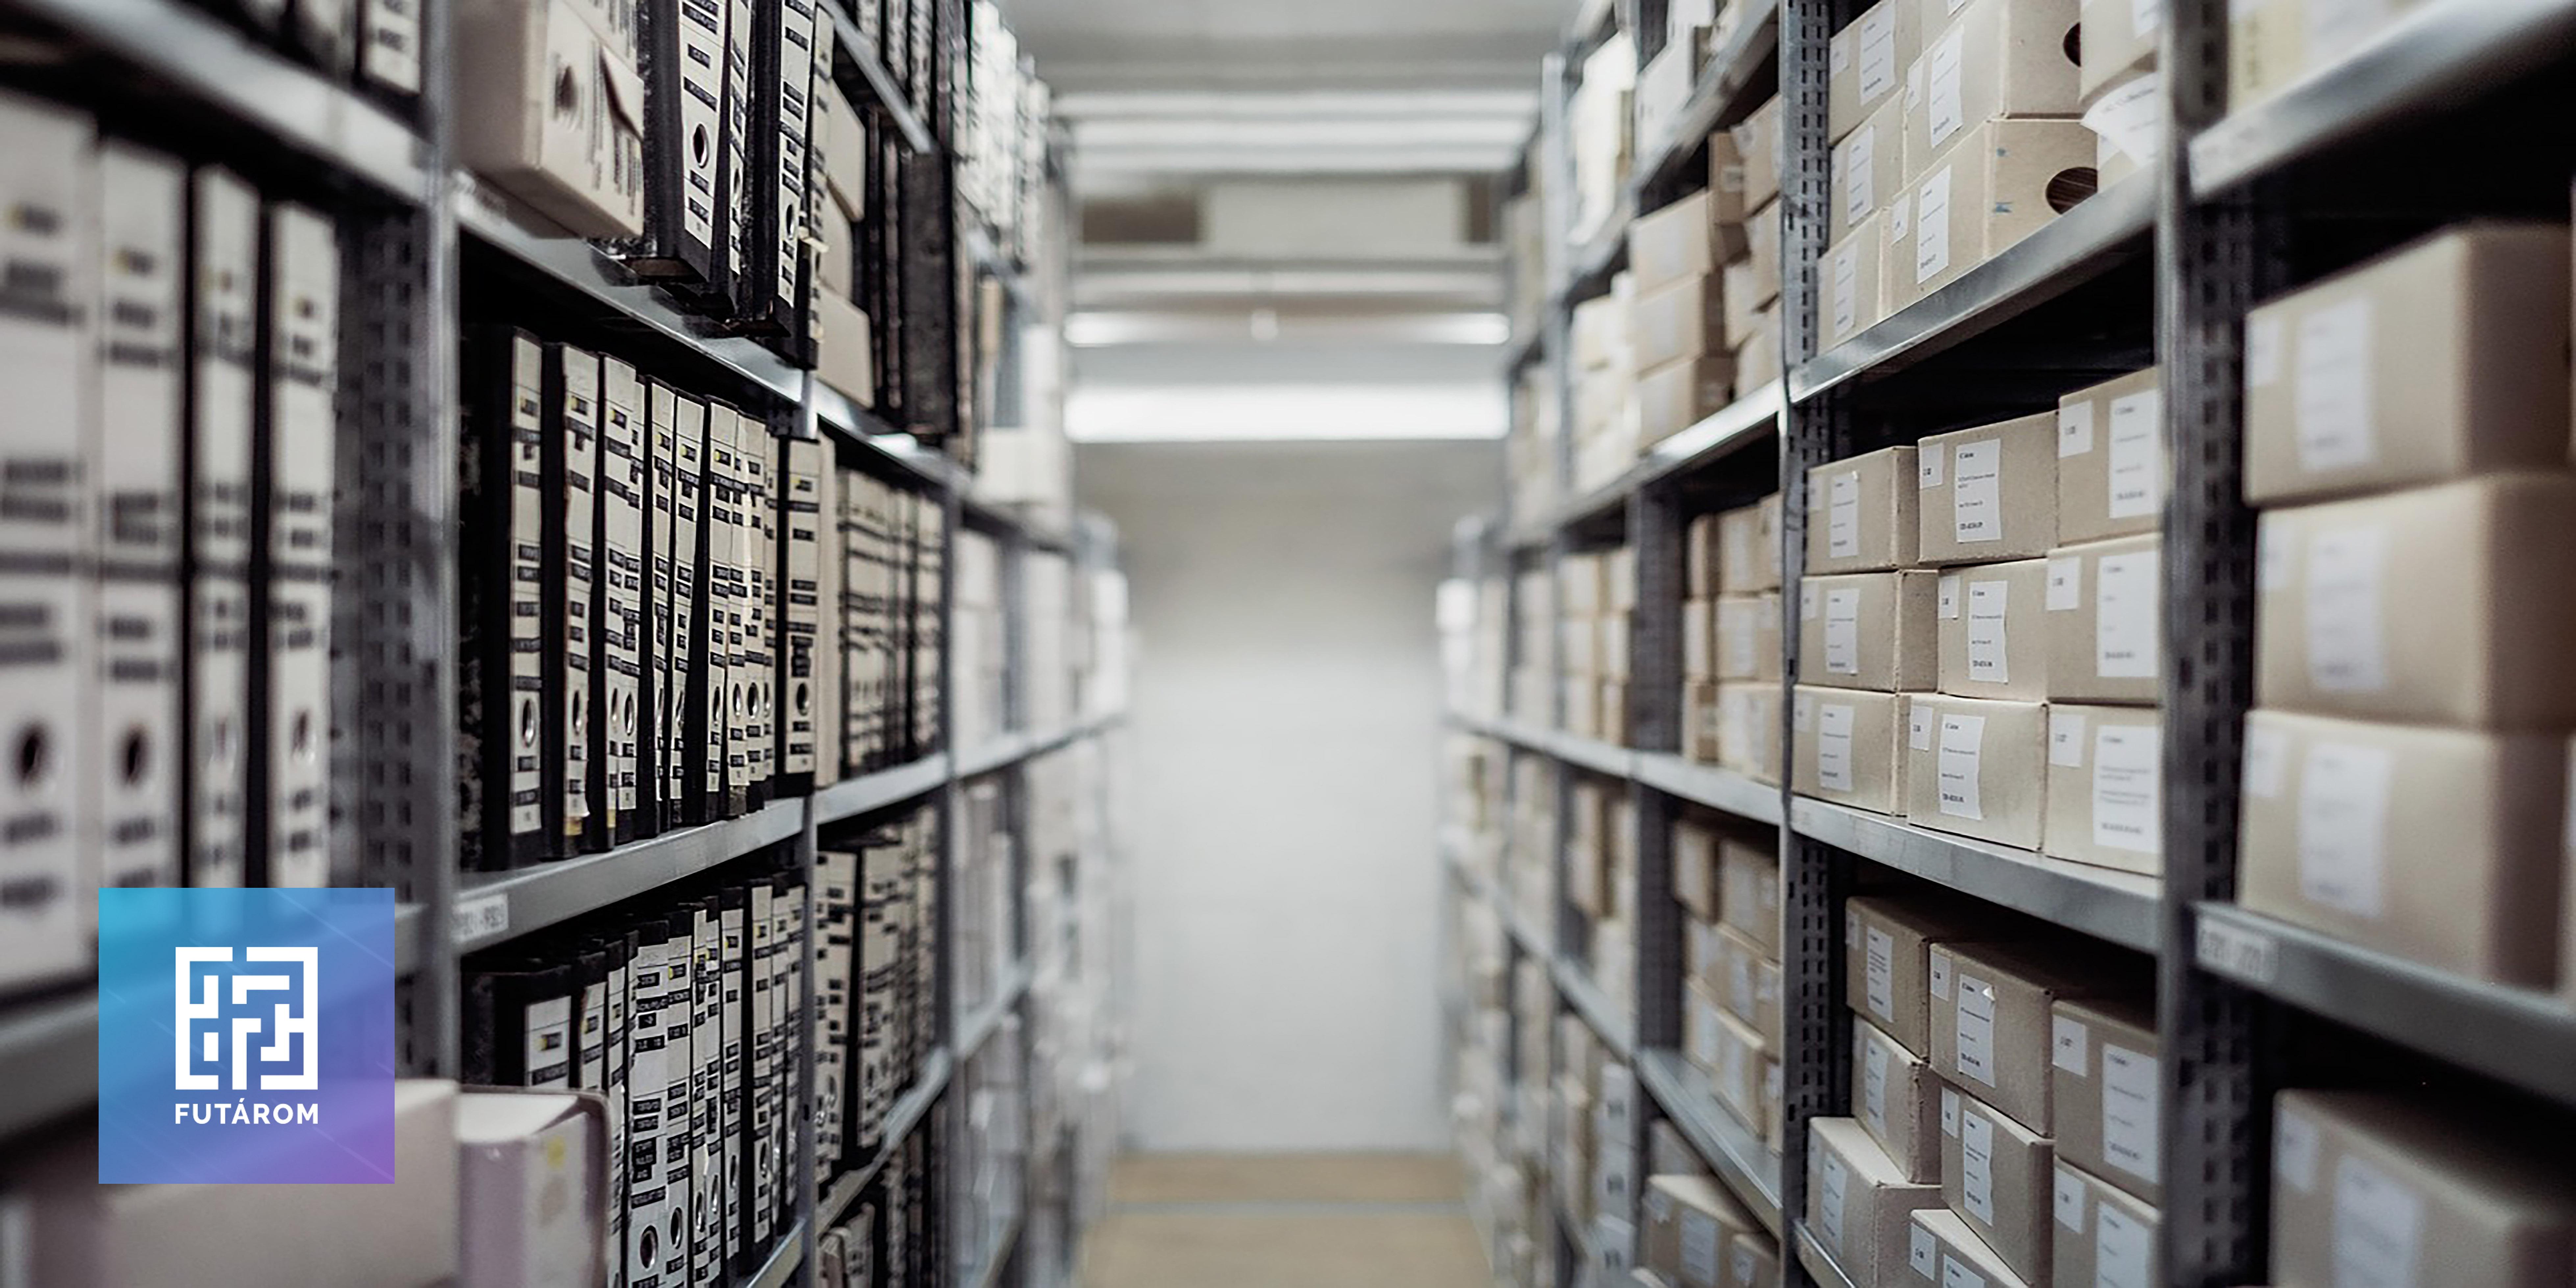 archive-1850170_1280_1.jpg